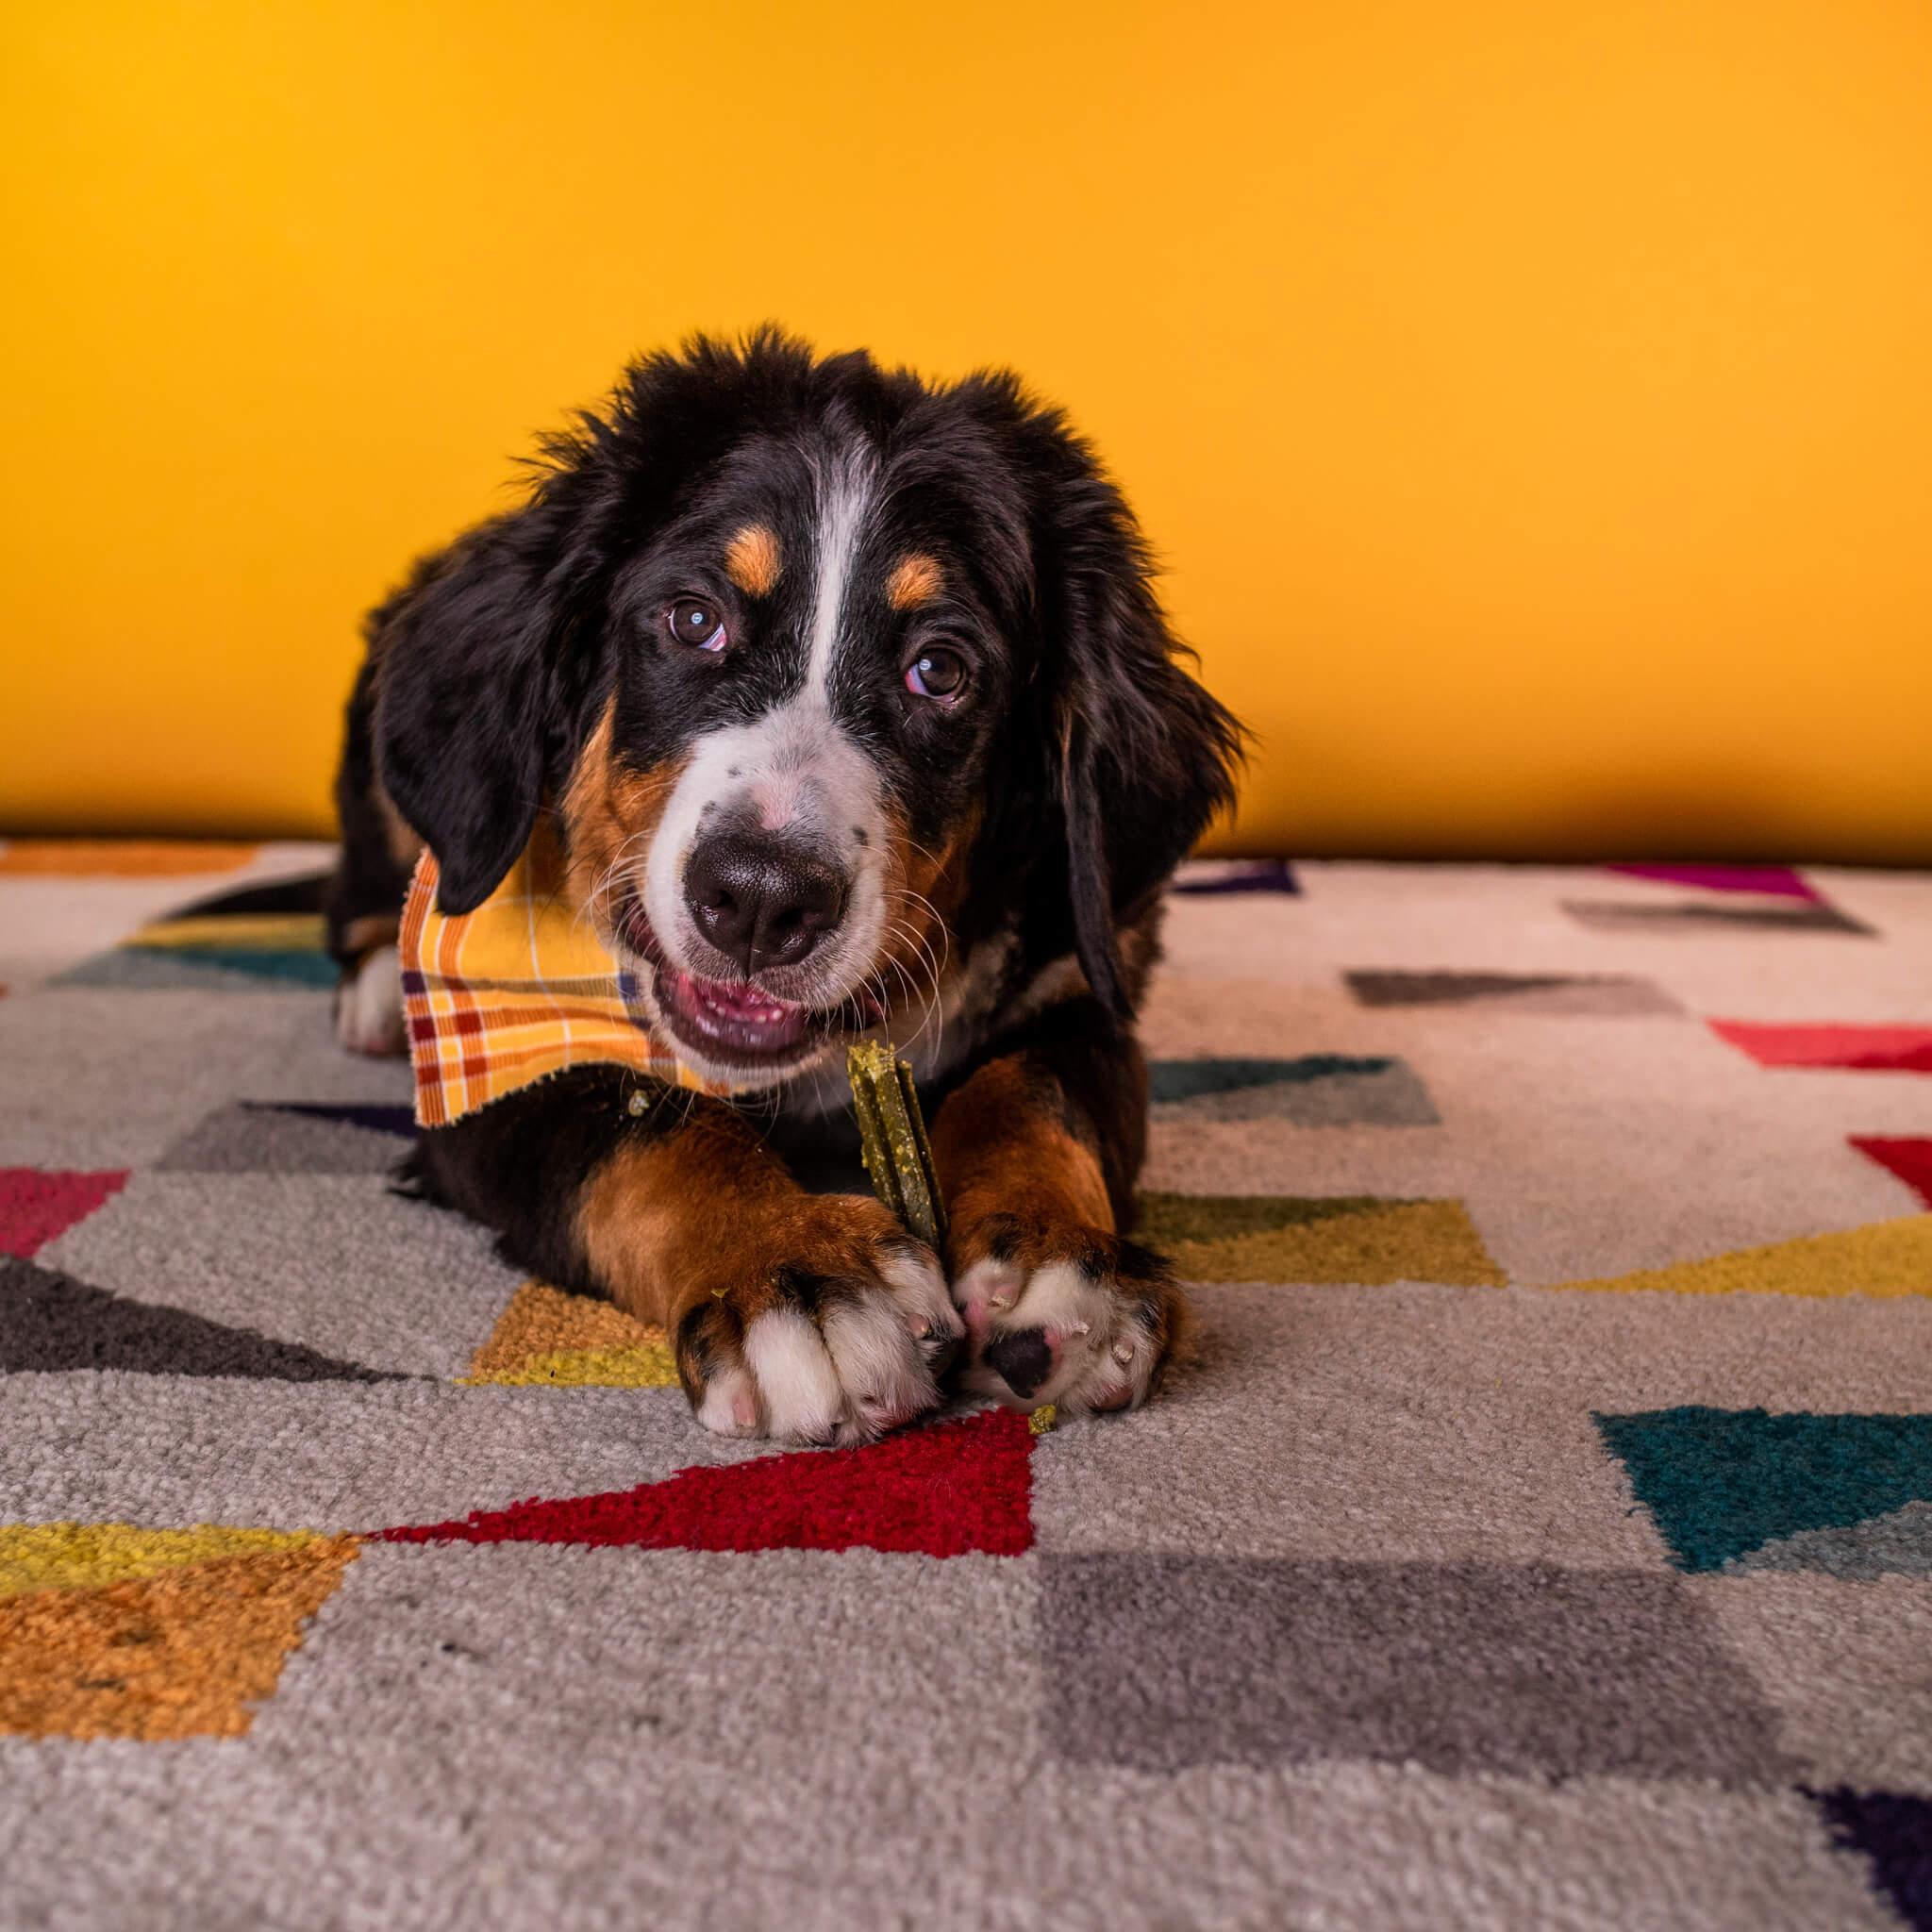 dog chewing on a dental chew | Pupford